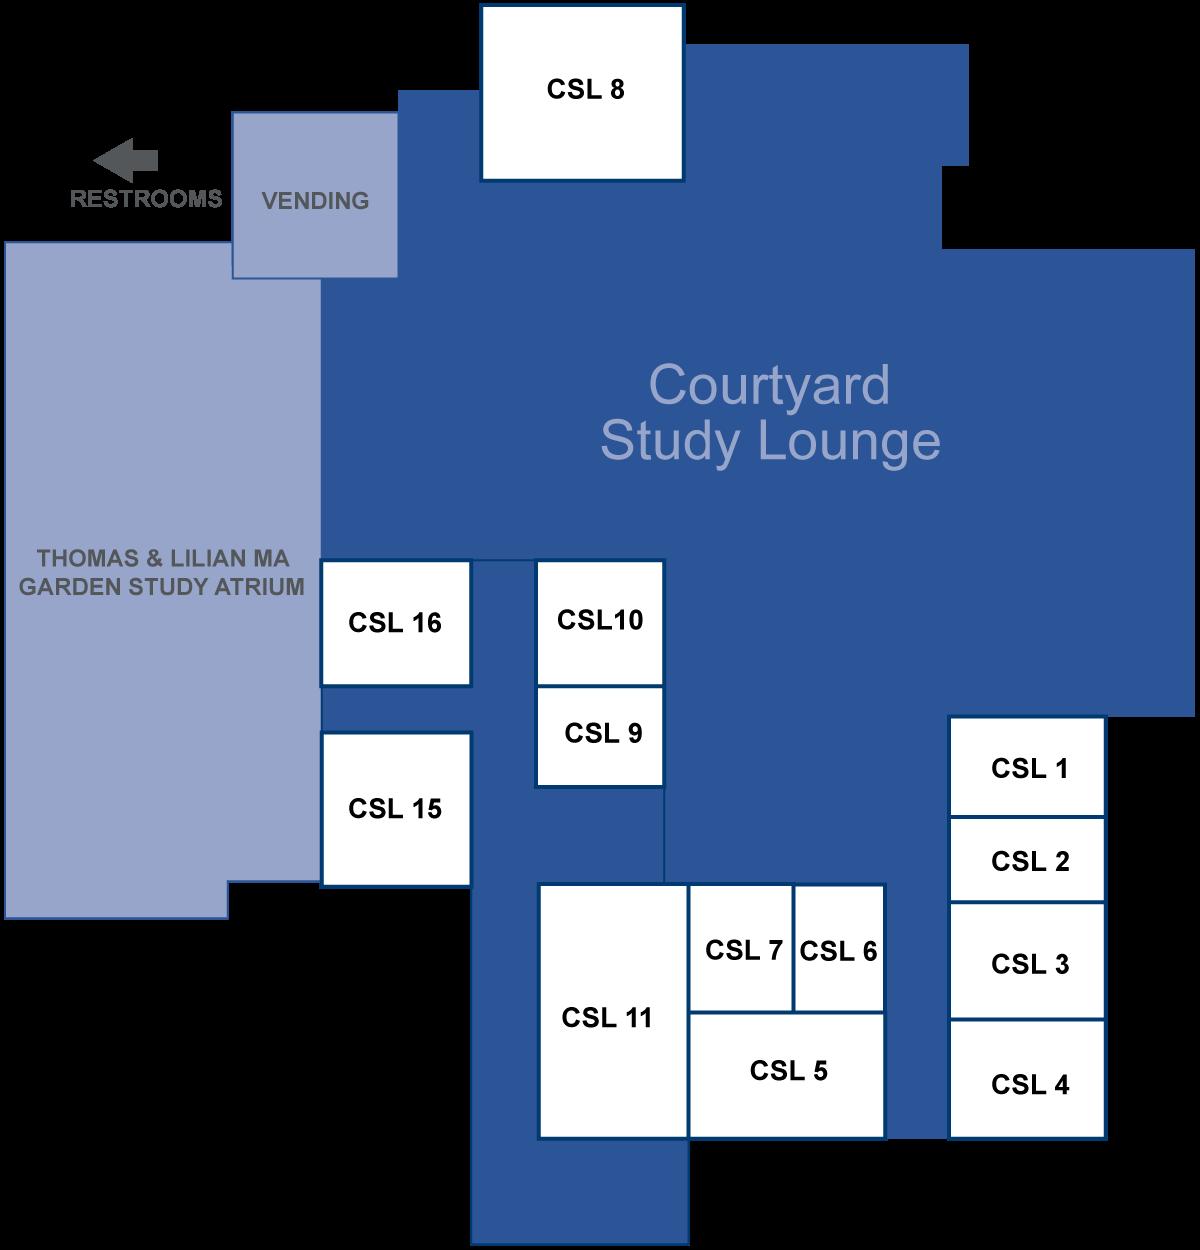 Book a Study Room Online | Student Center | University of California, Irvine